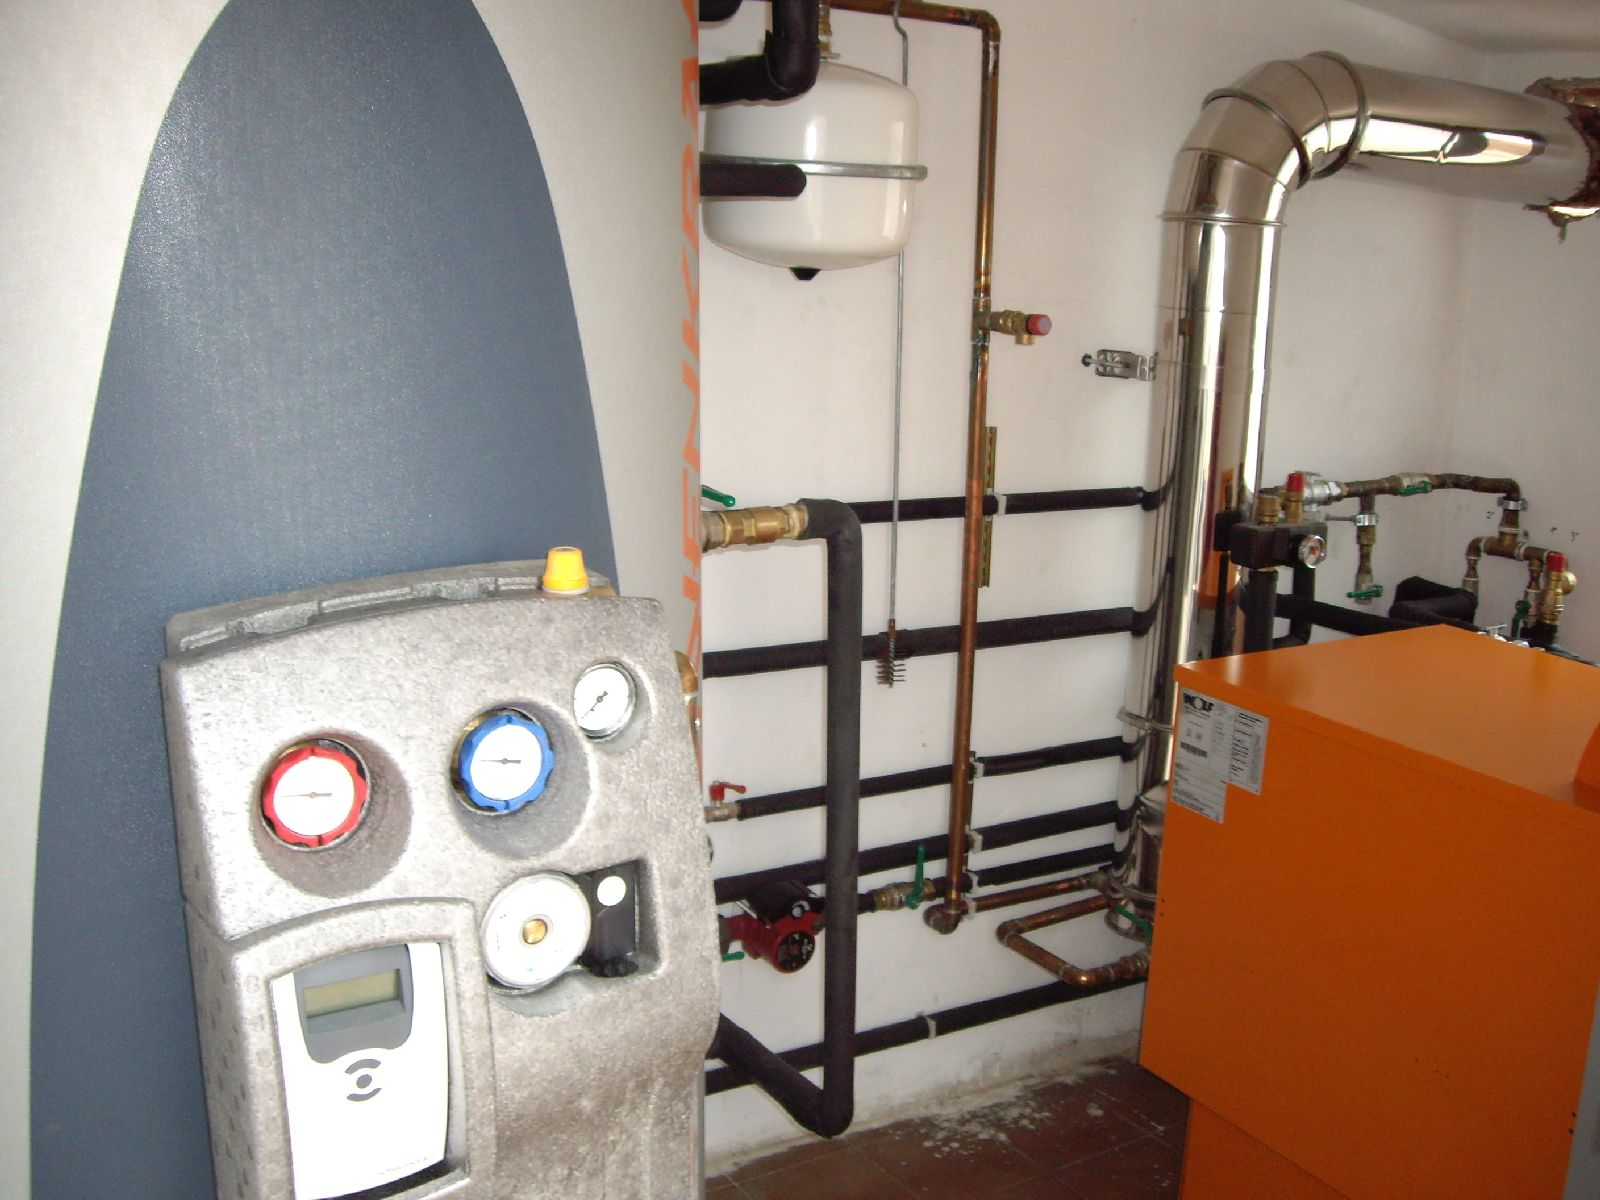 Instalacion de calefaccion solar for Calefaccion bomba de calor radiadores